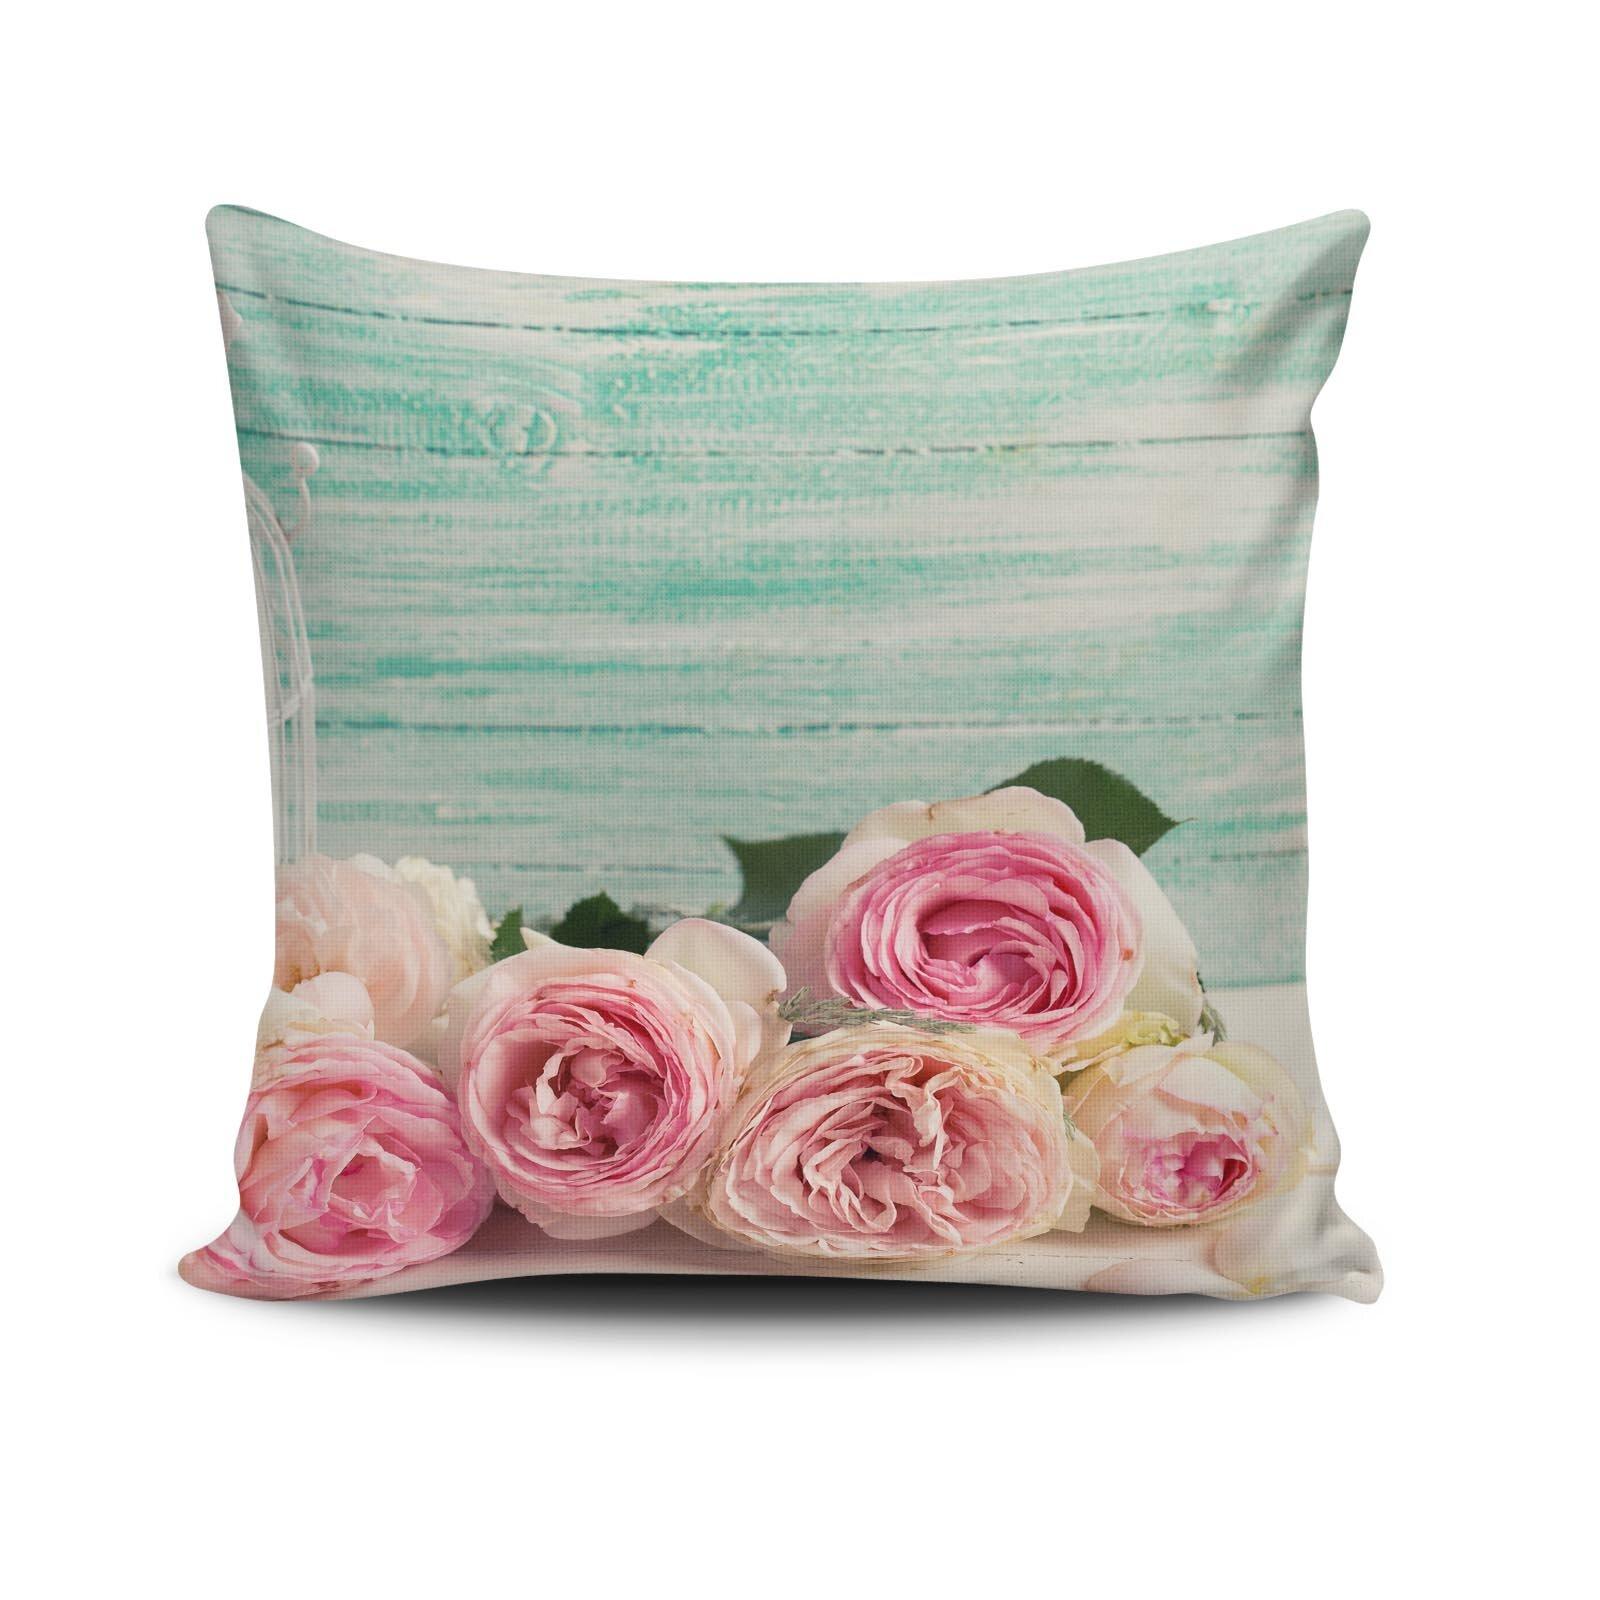 Perna decorativa Cushion Love, Dimensiune: 45 x 45 cm, Material exterior: 50% bumbac / 50% poliester 768CLV0131